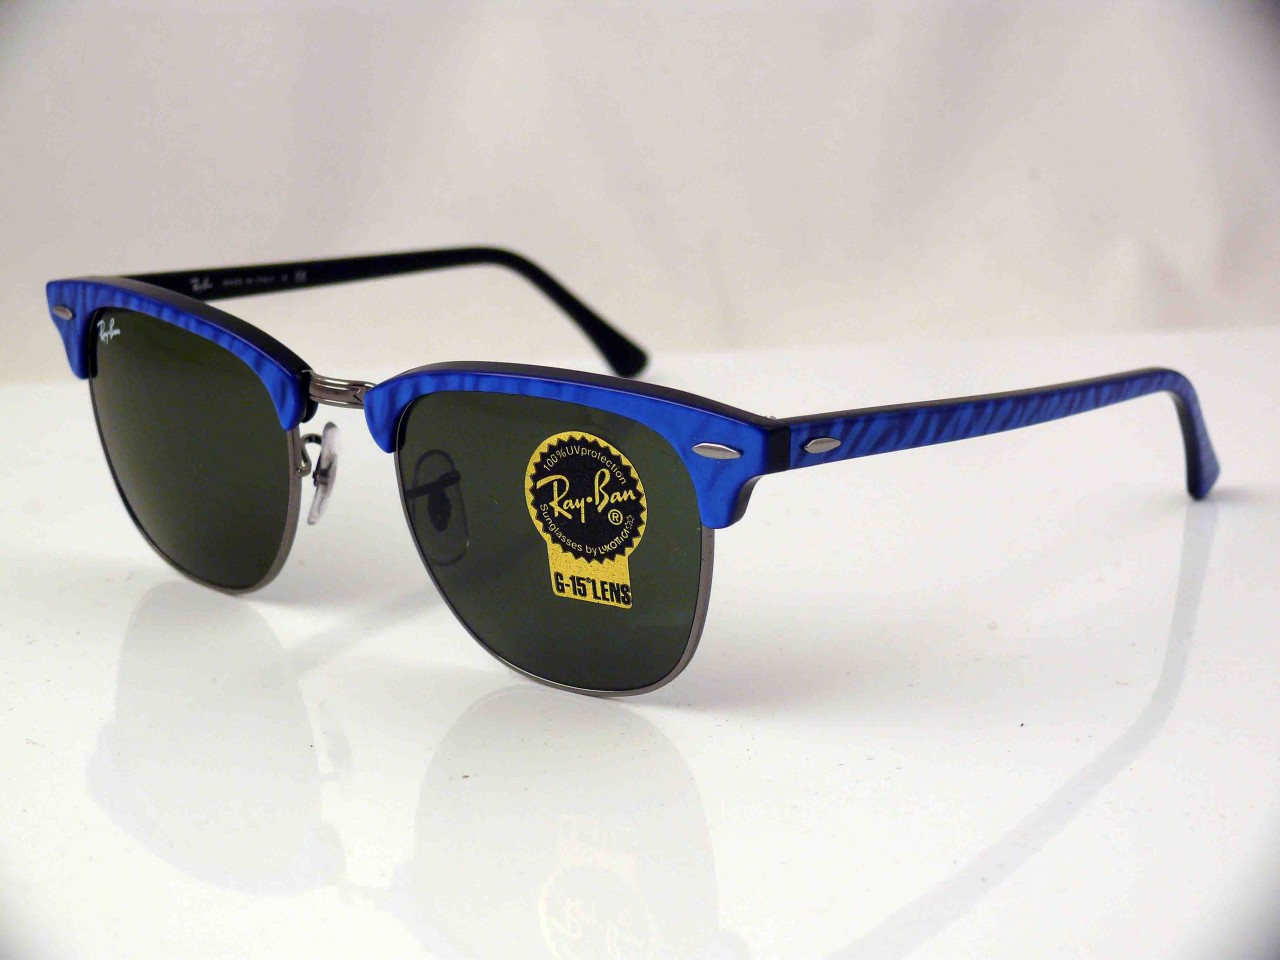 5bb839ded0c8 Ray Ban Cat Eye Sunglasses Ebay « Heritage Malta